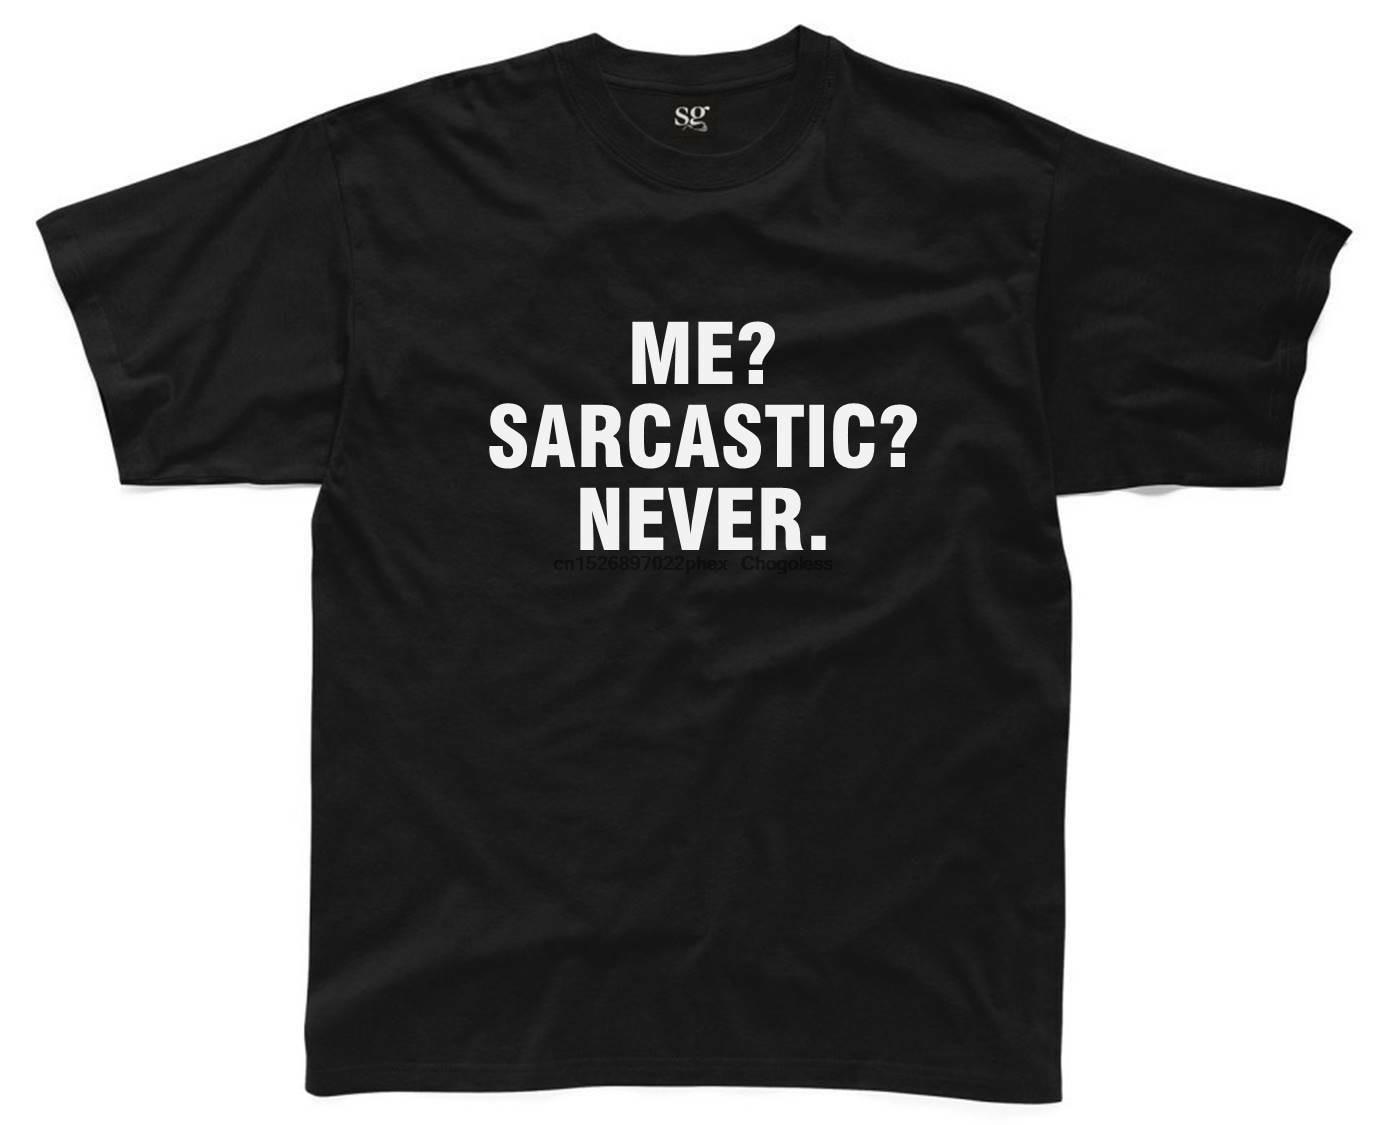 Camiseta sarcástica S-3XL sarcasmo engraçado impresso piada slogan topo